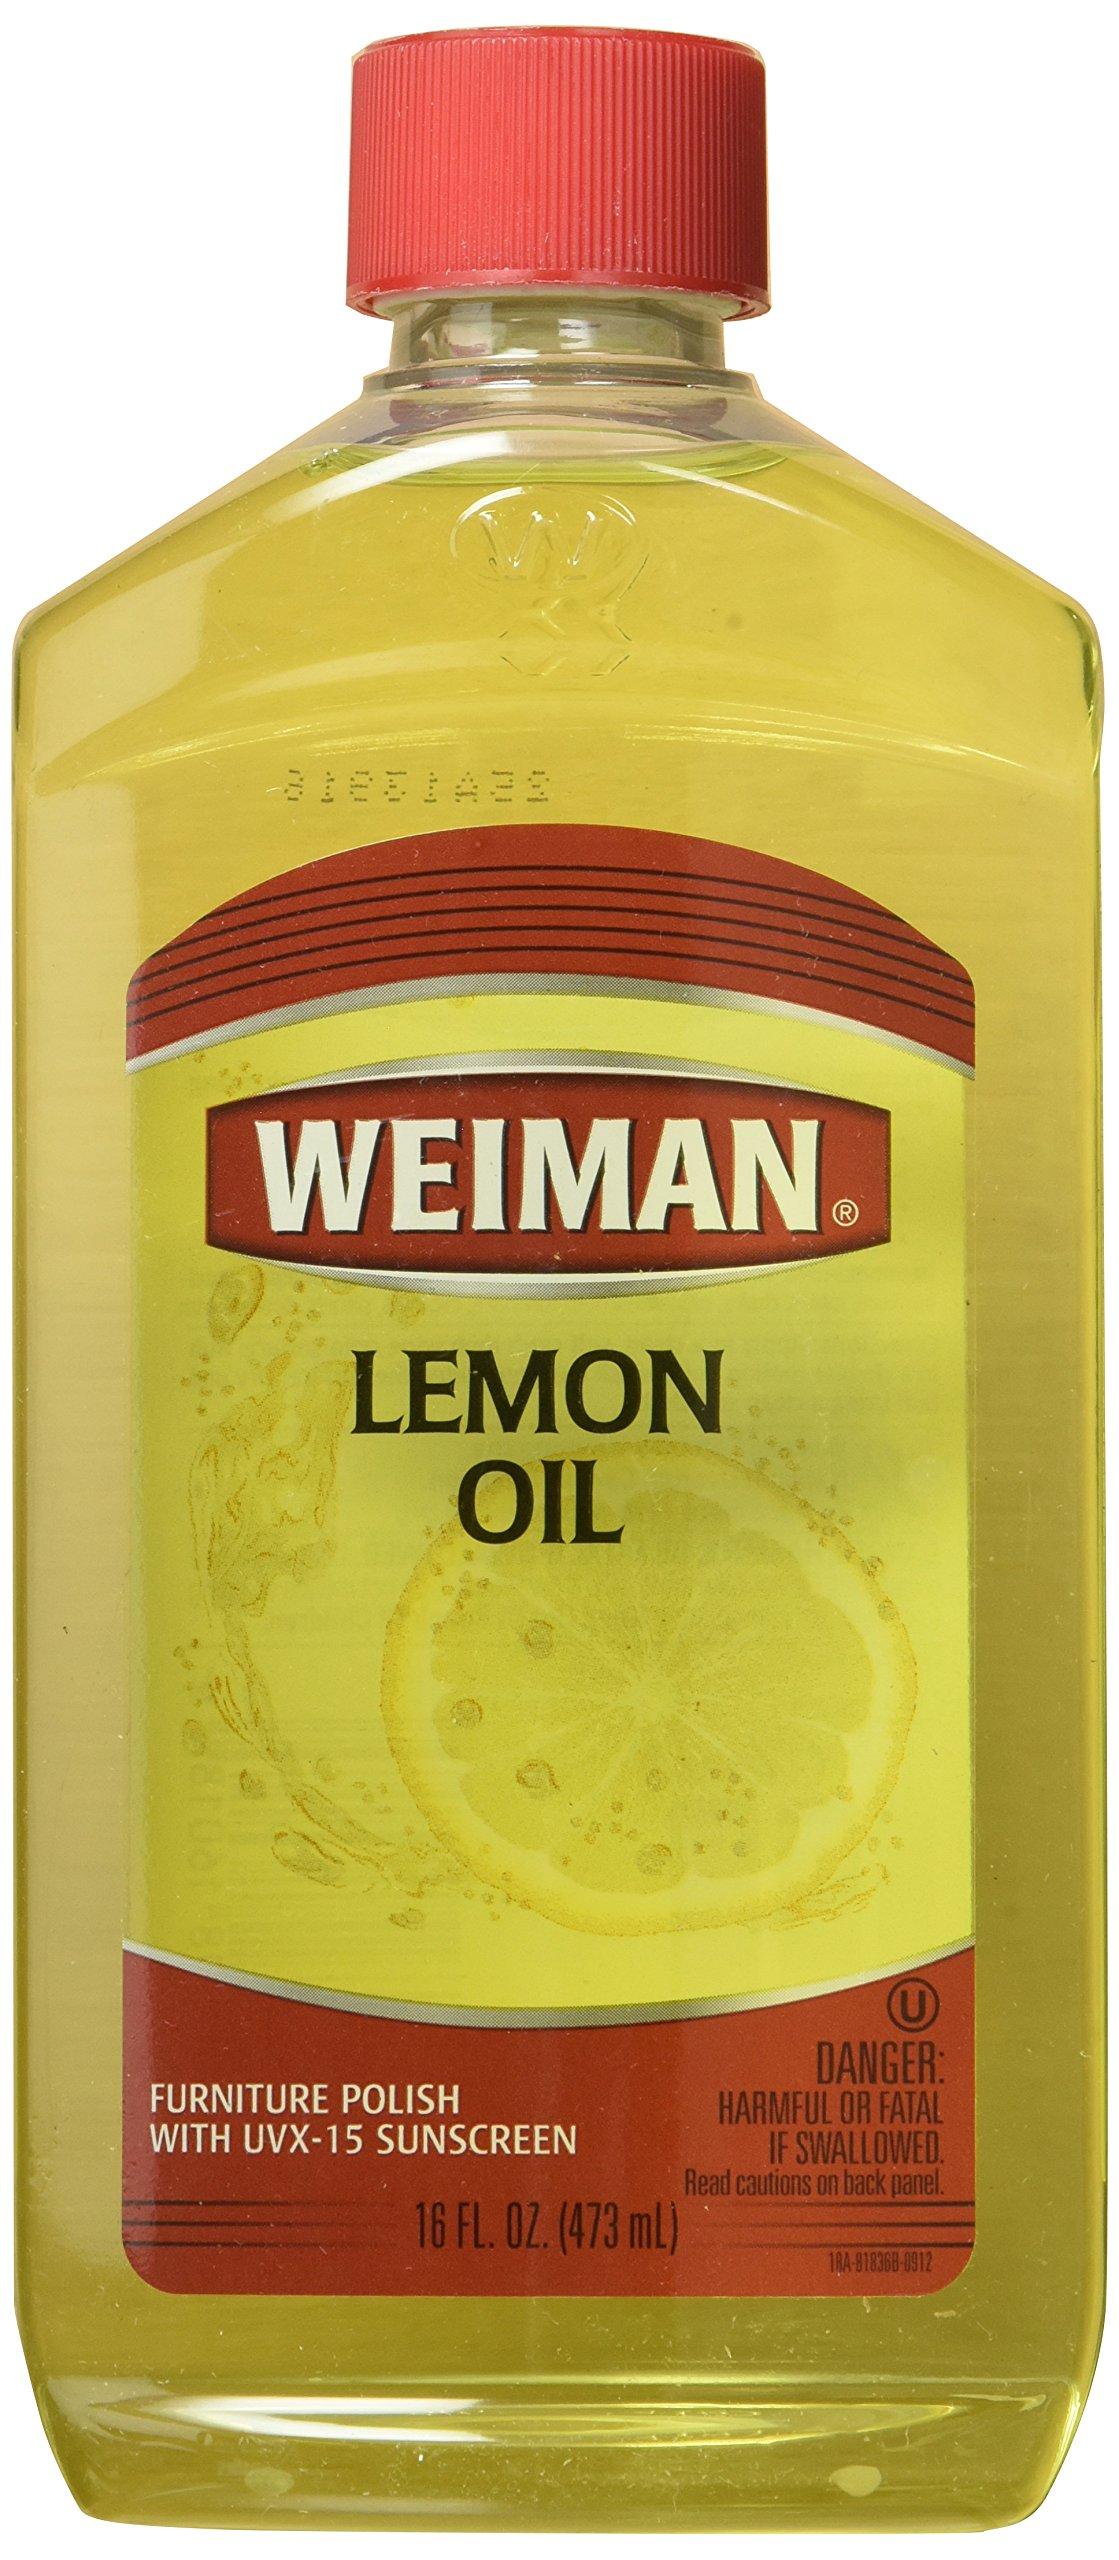 Weiman Furniture Polish Lemon Oil 16 Oz (Pack of 6) by Wieman